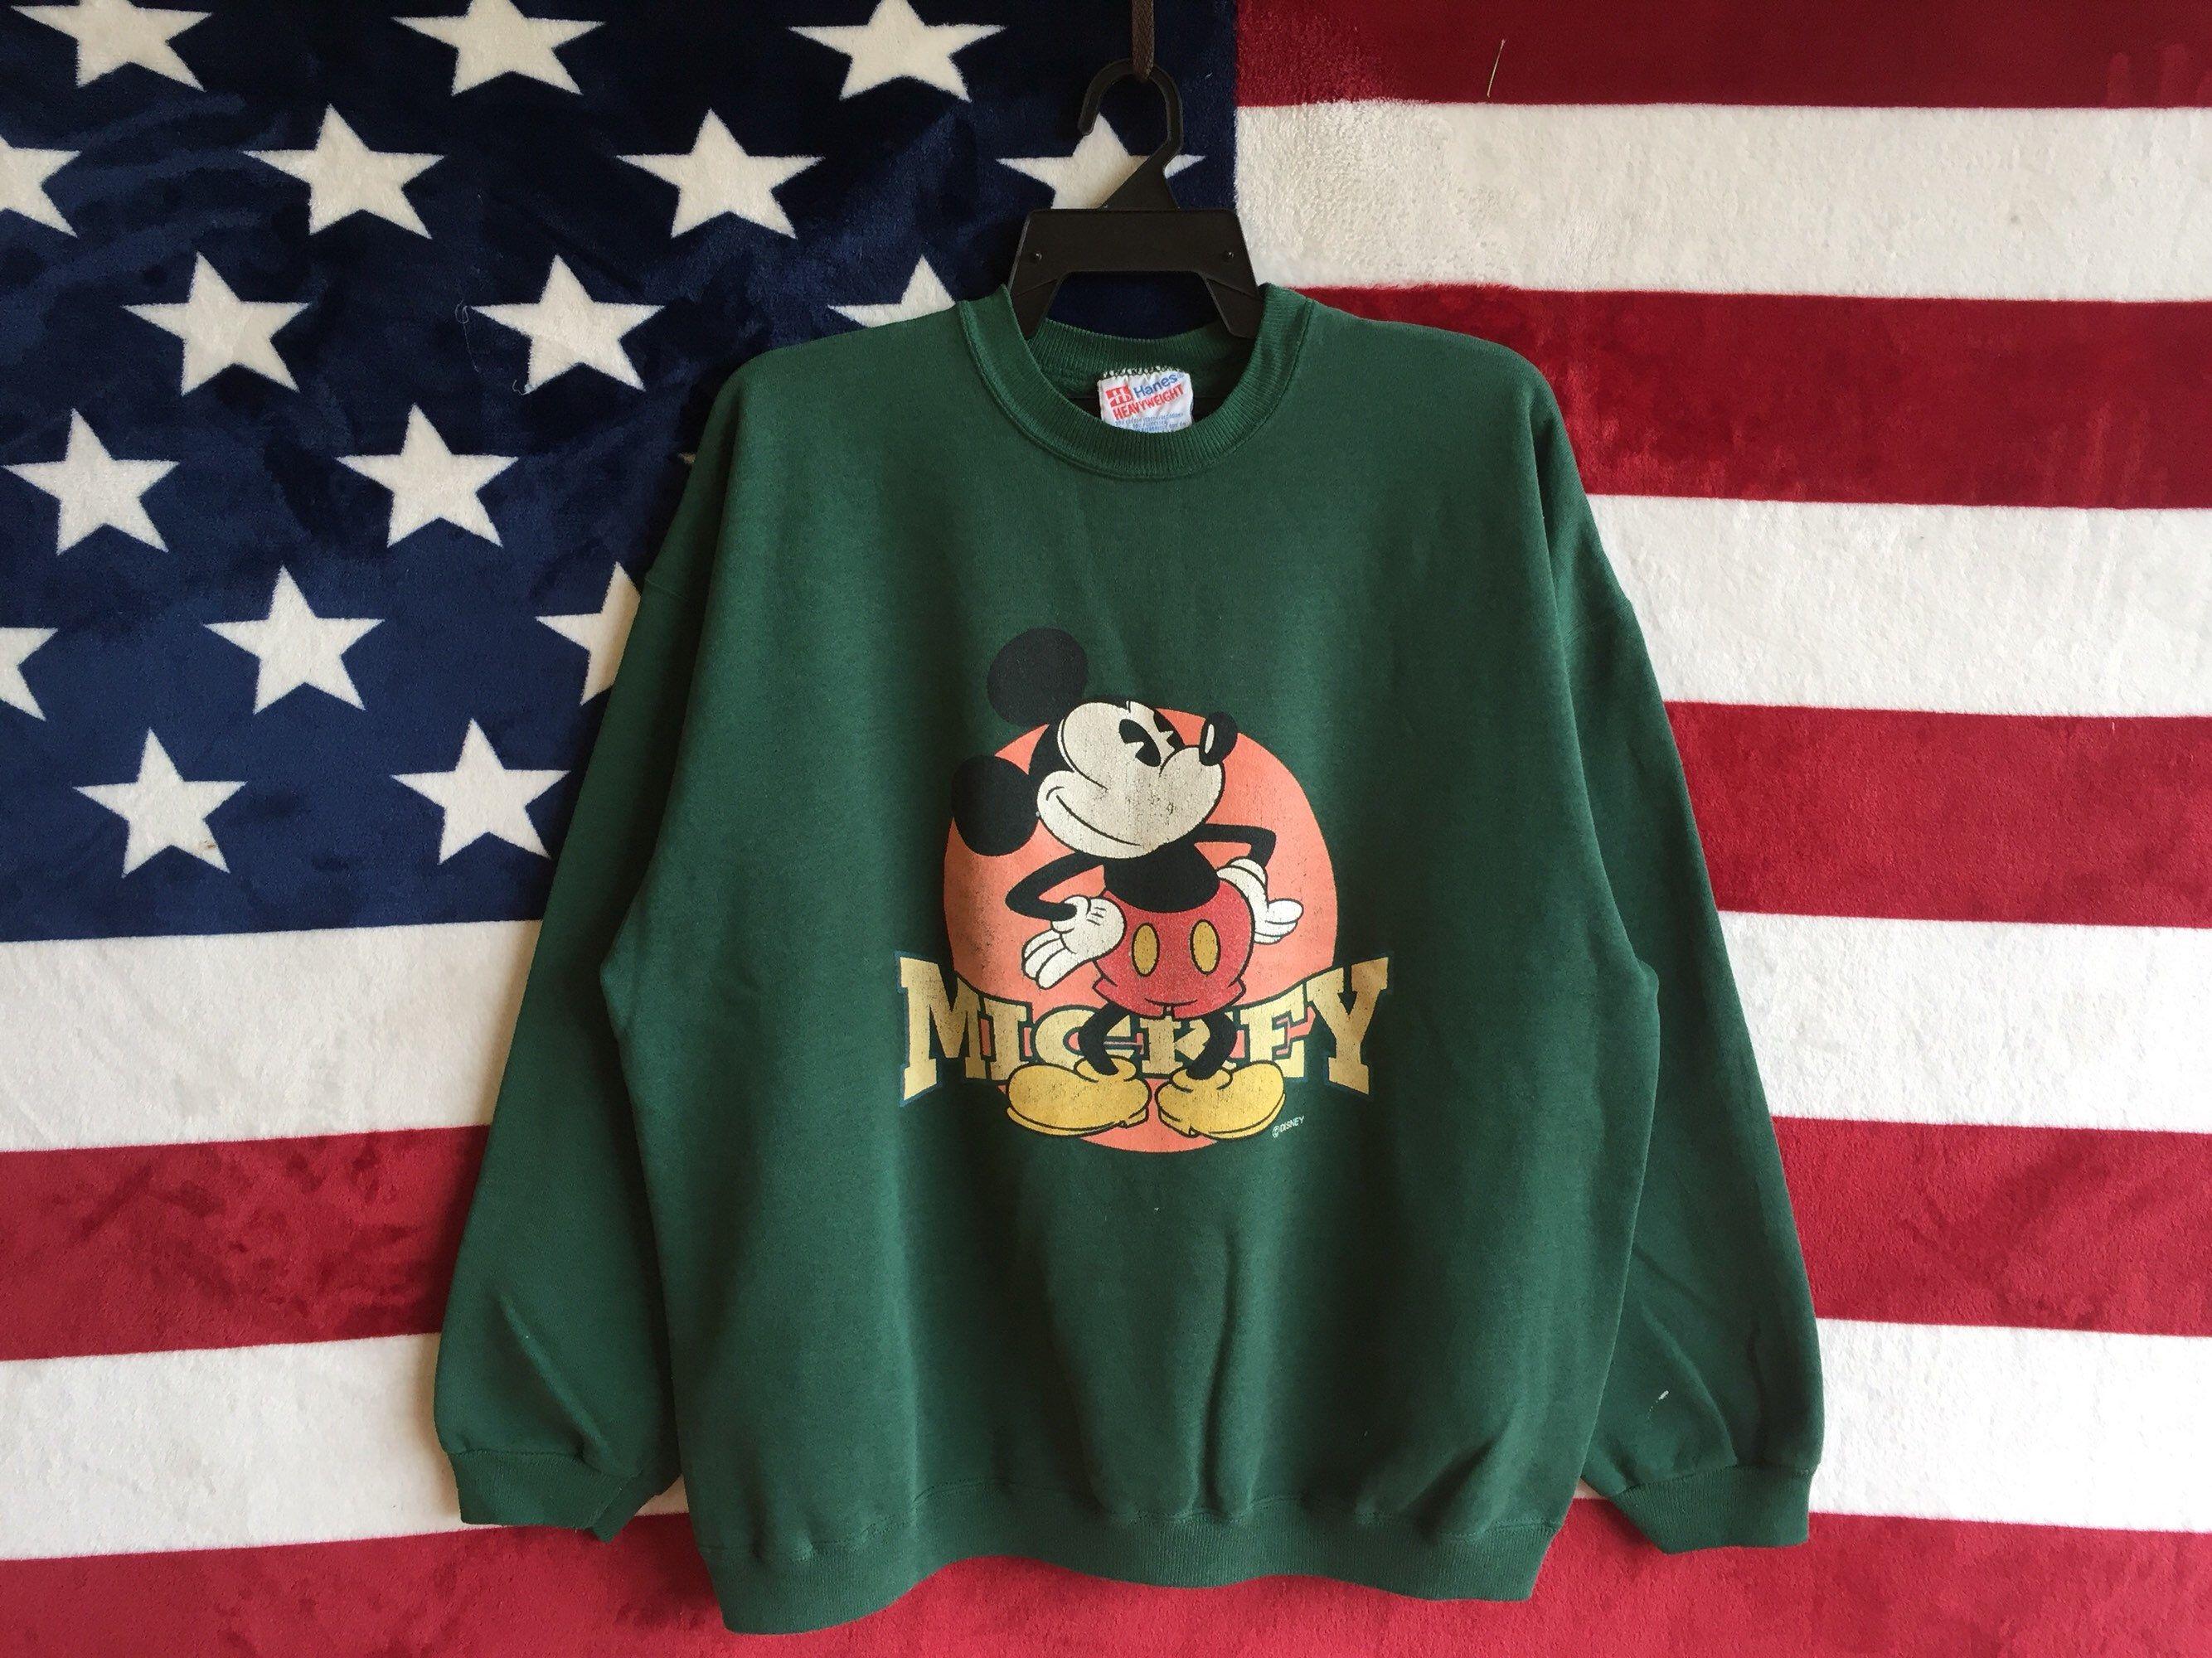 Vintage 90s Disney Mickey Mouse Sweatshirt Green Colour Mickey Mouse Crewneck By Disney Sweat Vintage Crewneck Sweatshirt Disney Sweatshirts Vintage Sweatshirt [ 2000 x 2668 Pixel ]